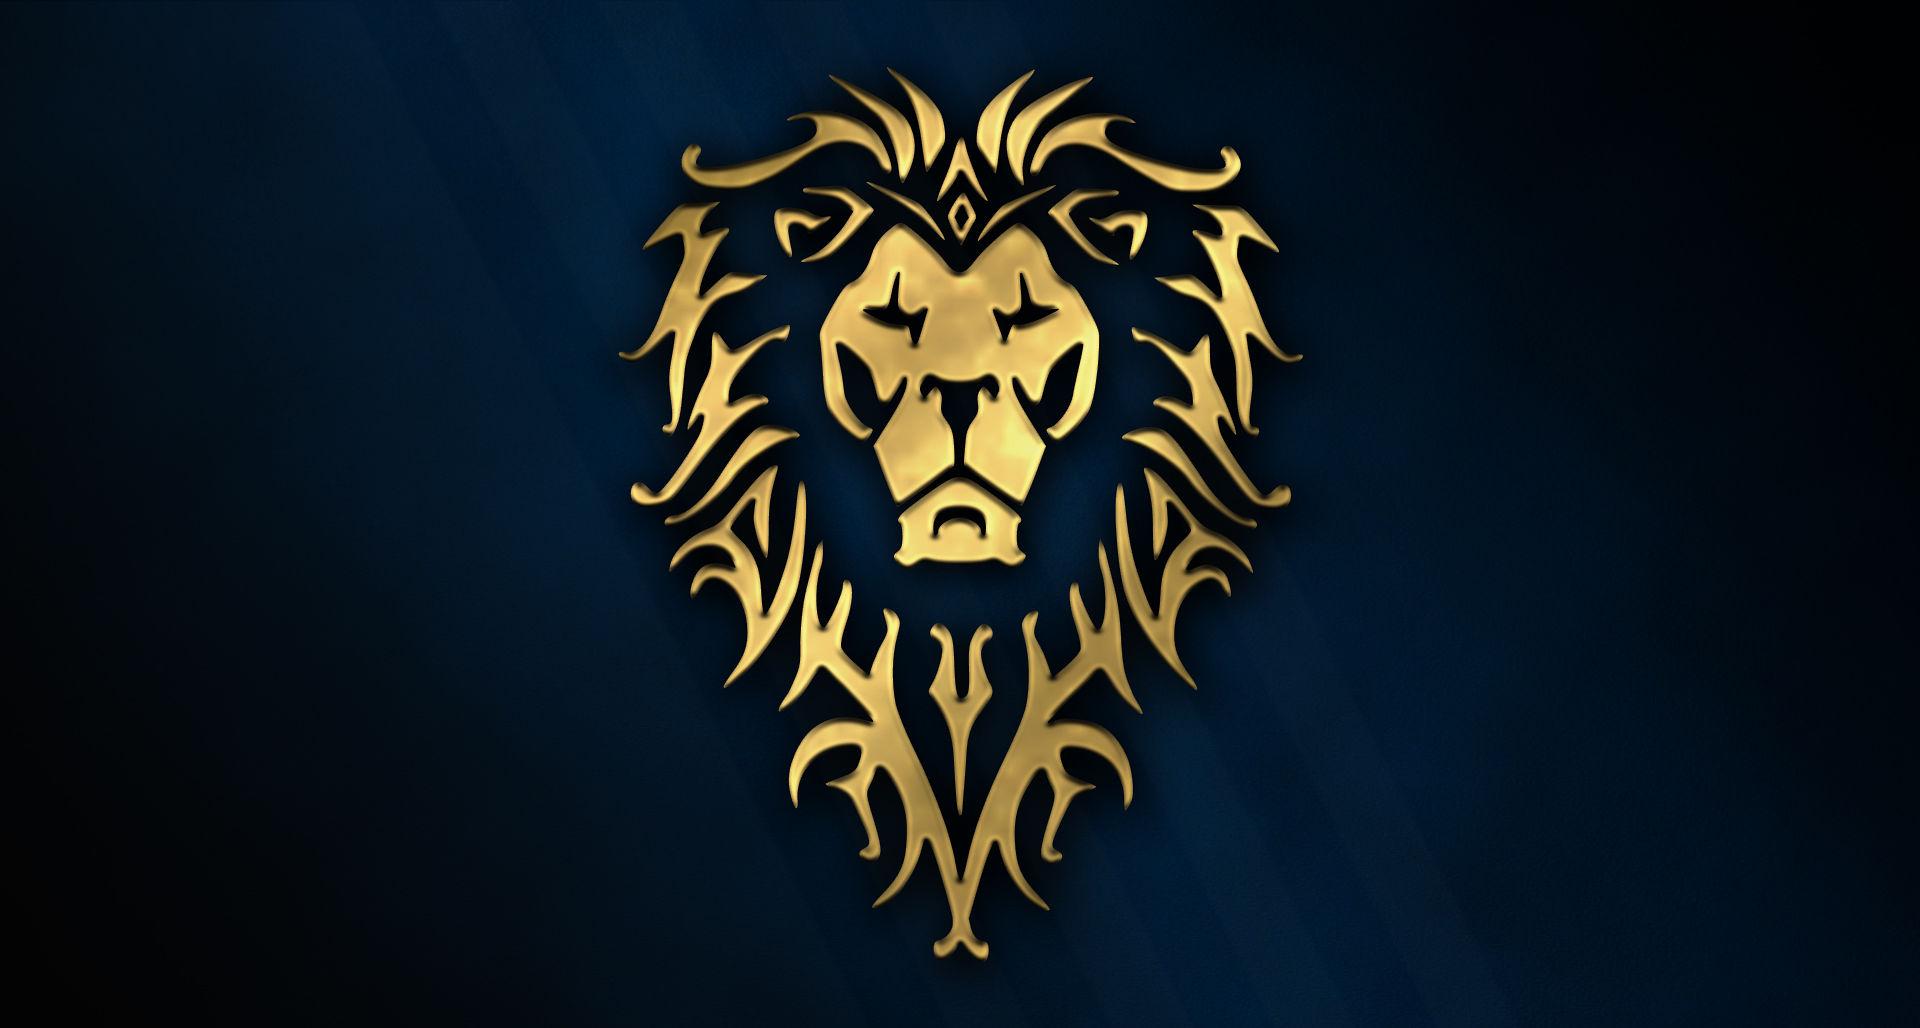 AGOT Custom Noble House mod | The Citadel: A Game of Thrones Mod